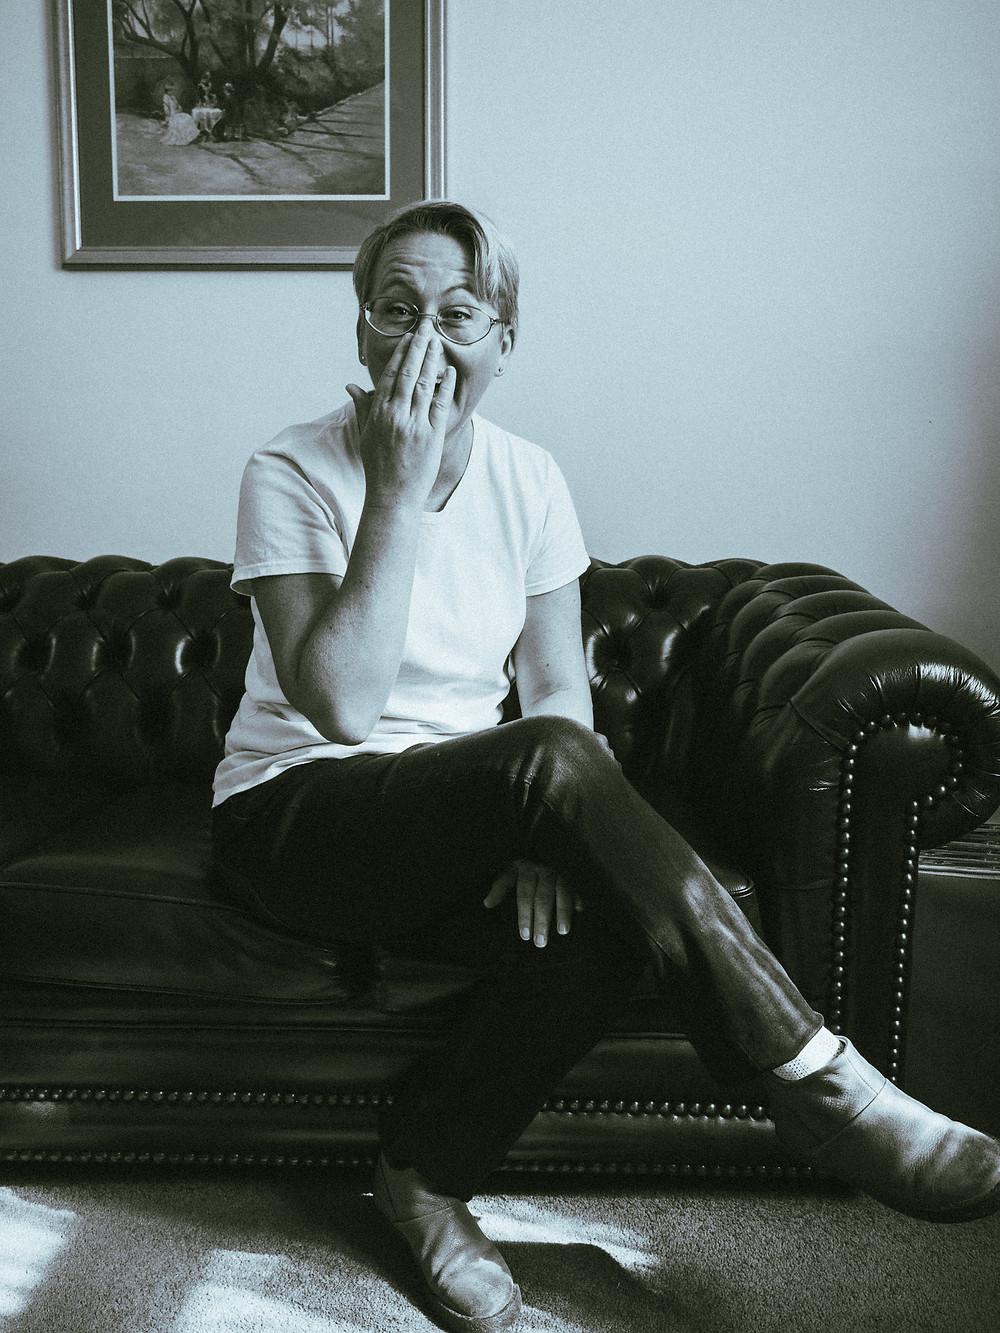 Kecia, photography by Lila Marvell